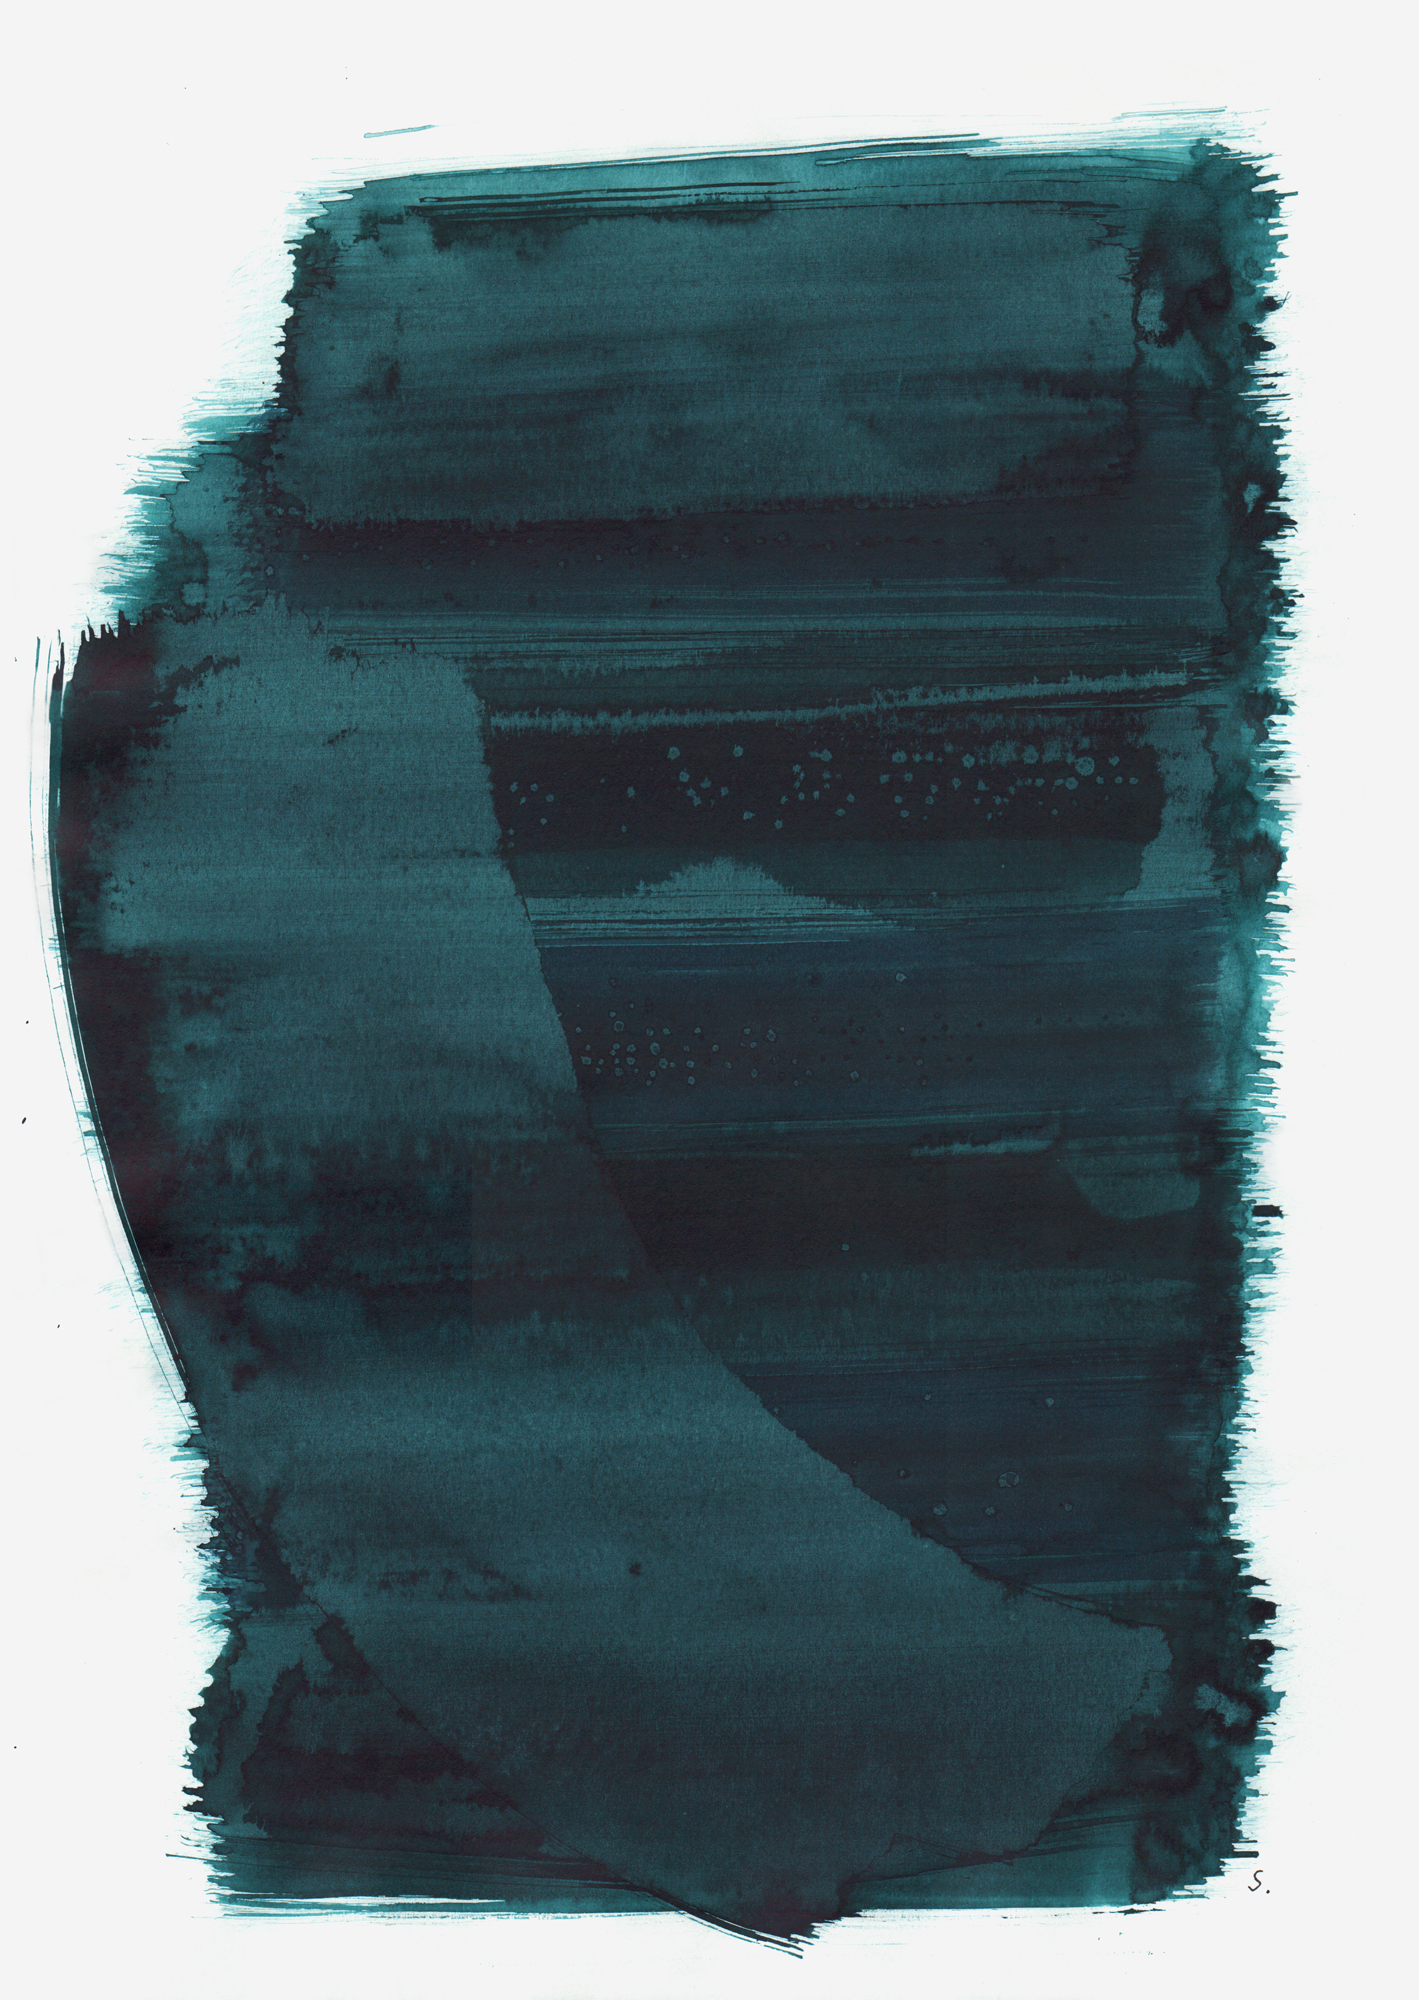 """An Tana Austerlitz"", 2019, Tusche auf Papier, 48 x 36cm; ©: Konstanze Sailer [Austerlitz, Tana; * 12.12.1939 in Berlin; deportiert aus Berlin; † nach dem 04.10.1944 in Auschwitz]"